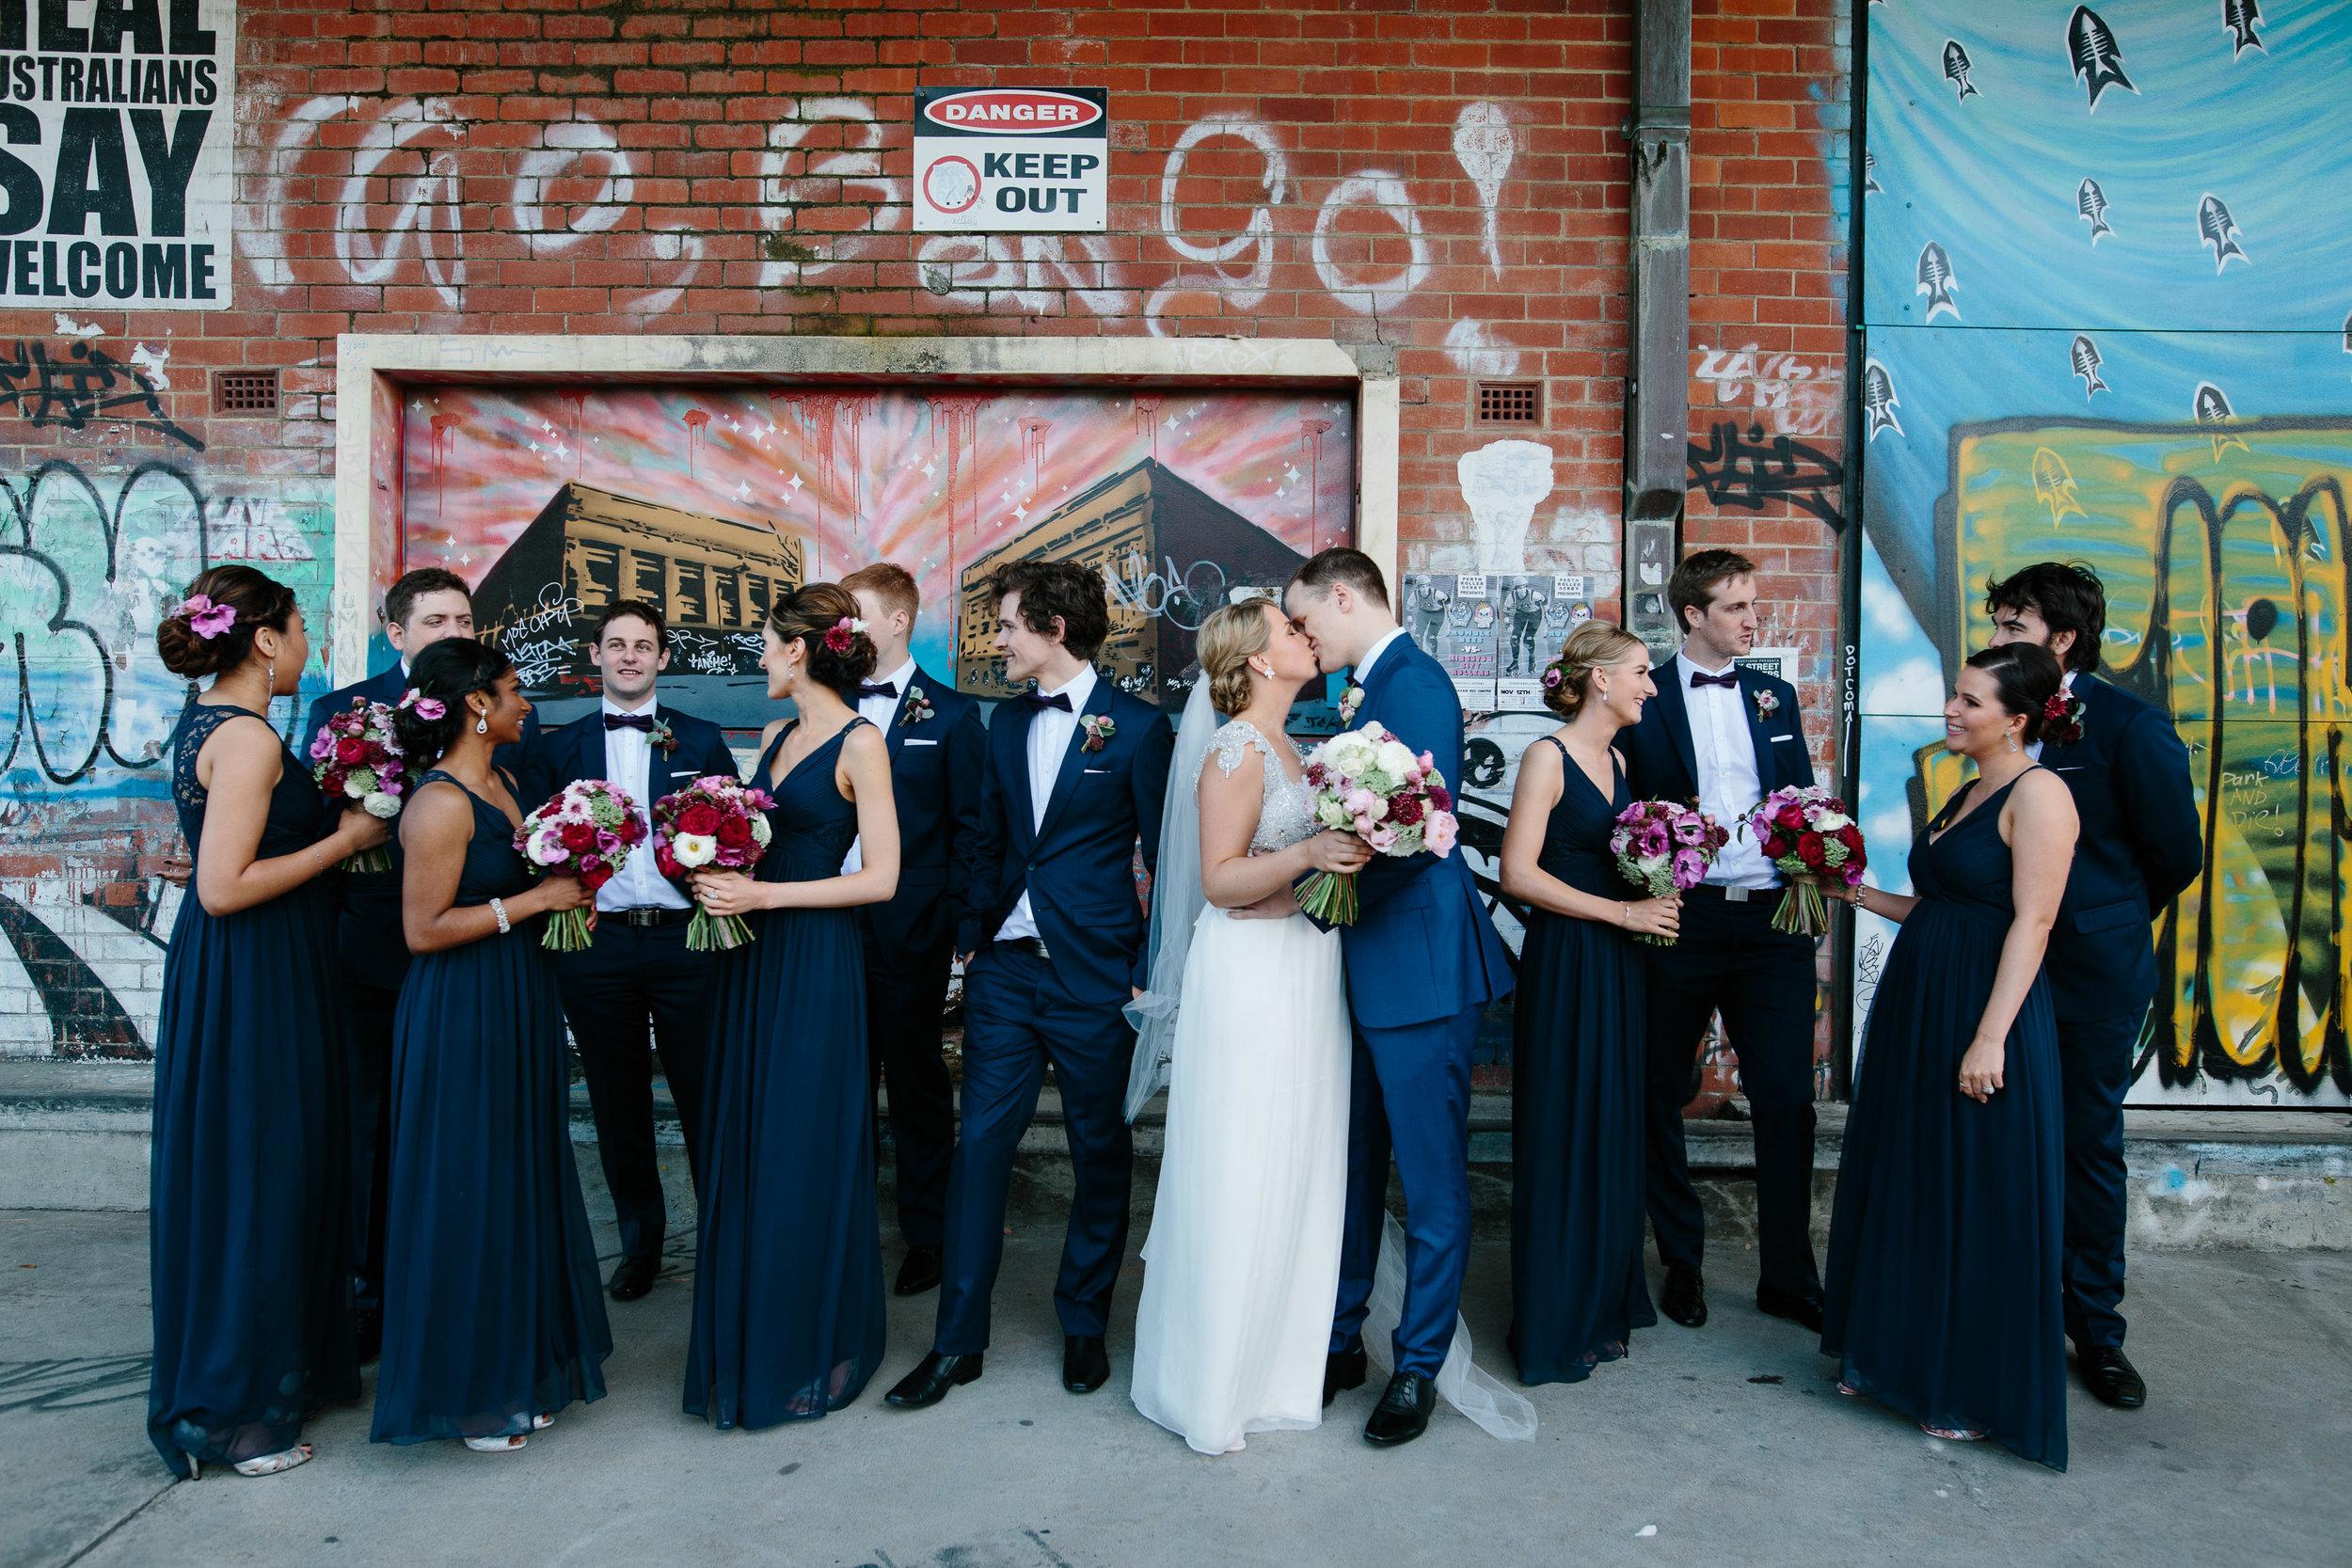 Fremantle wedding-Peggy Saas2.jpg